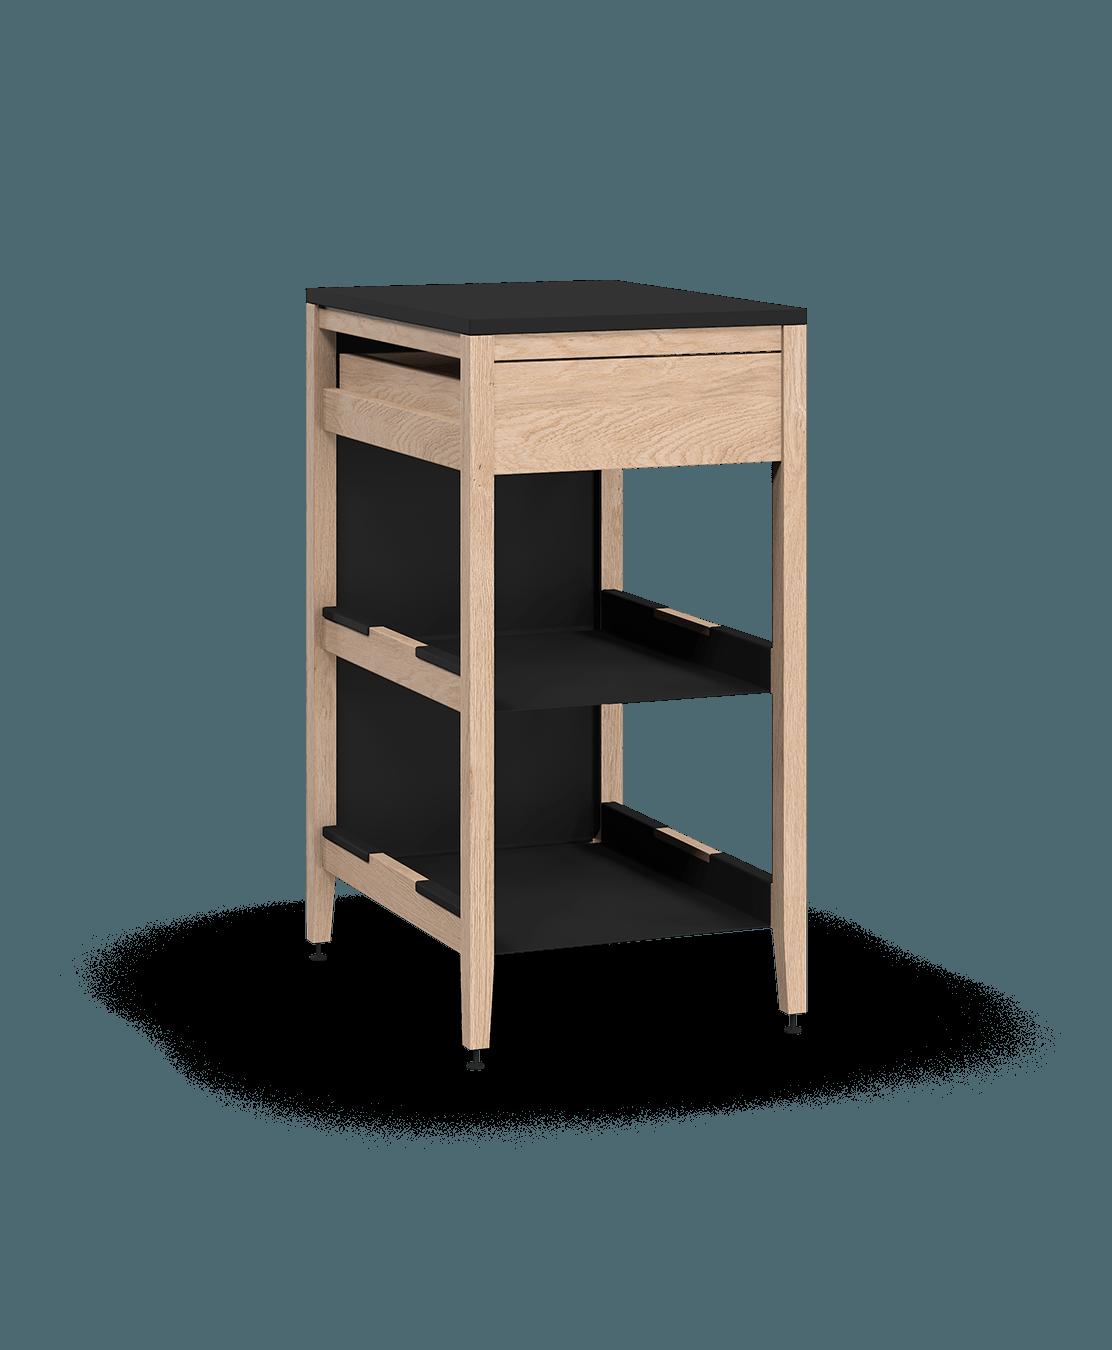 coquo radix white oak solid wood modular 2 shelves 1 drawer base kitchen cabinet 18 inch C1-C-18TB-1022-NA